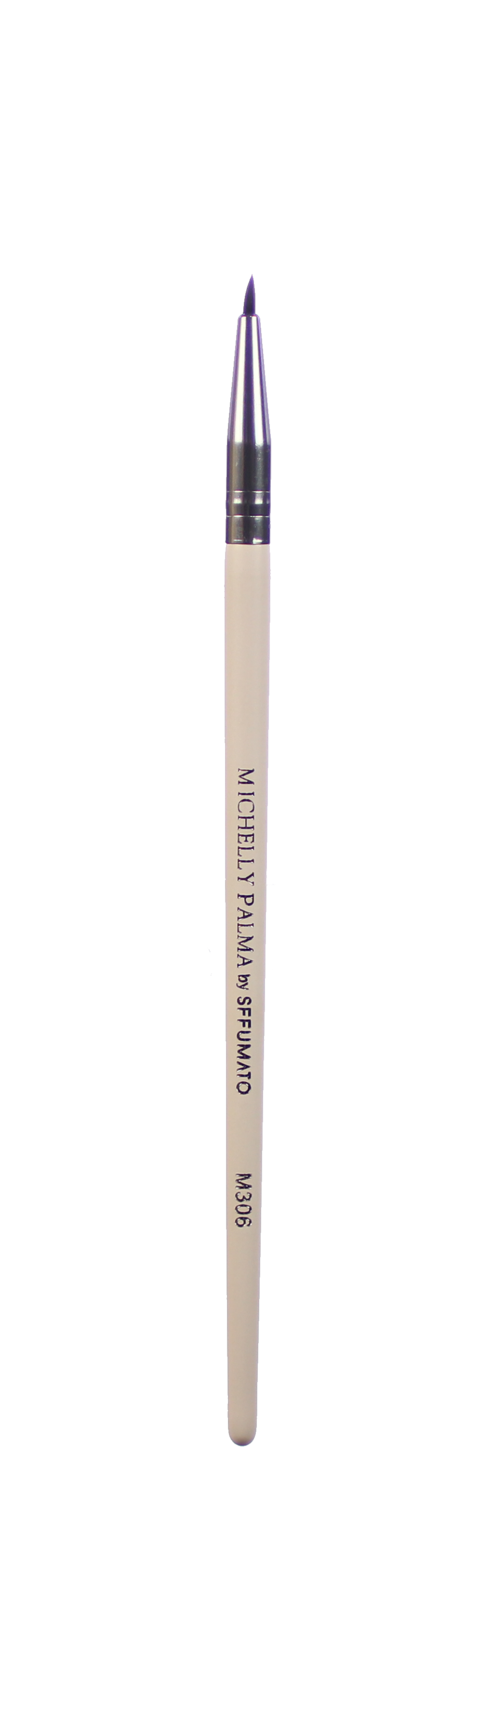 Pincel de Precisão Fino M306 Michelly Palma by Sffumato Beauty